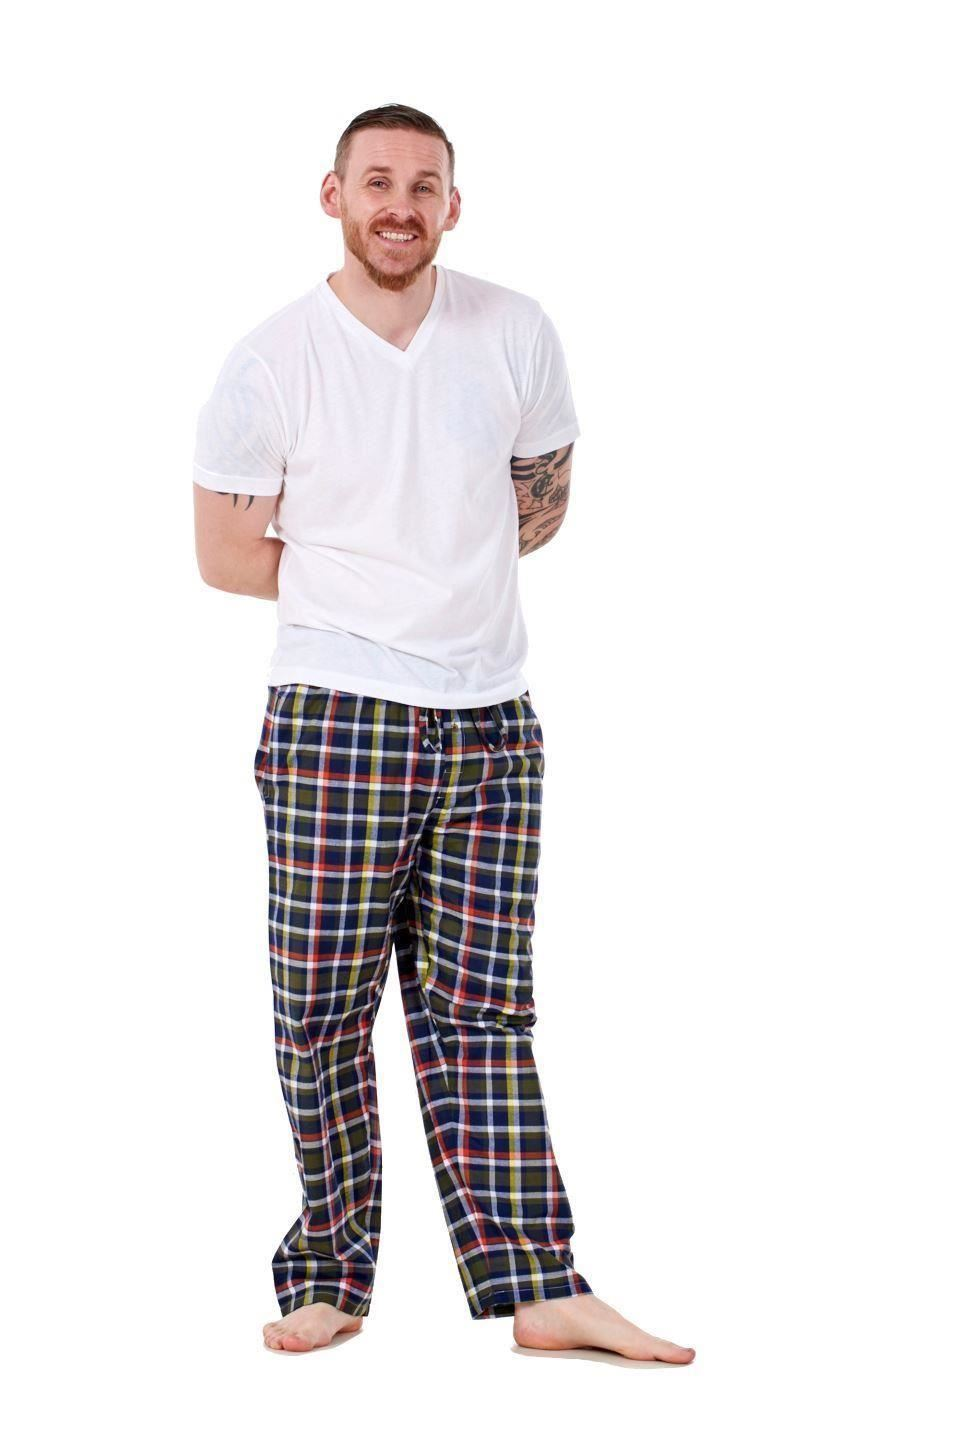 Mens-Pyjama-Bottoms-Rich-Cotton-Woven-Check-Lounge-Pant-Nightwear-Big-3XL-to-5XL Indexbild 37